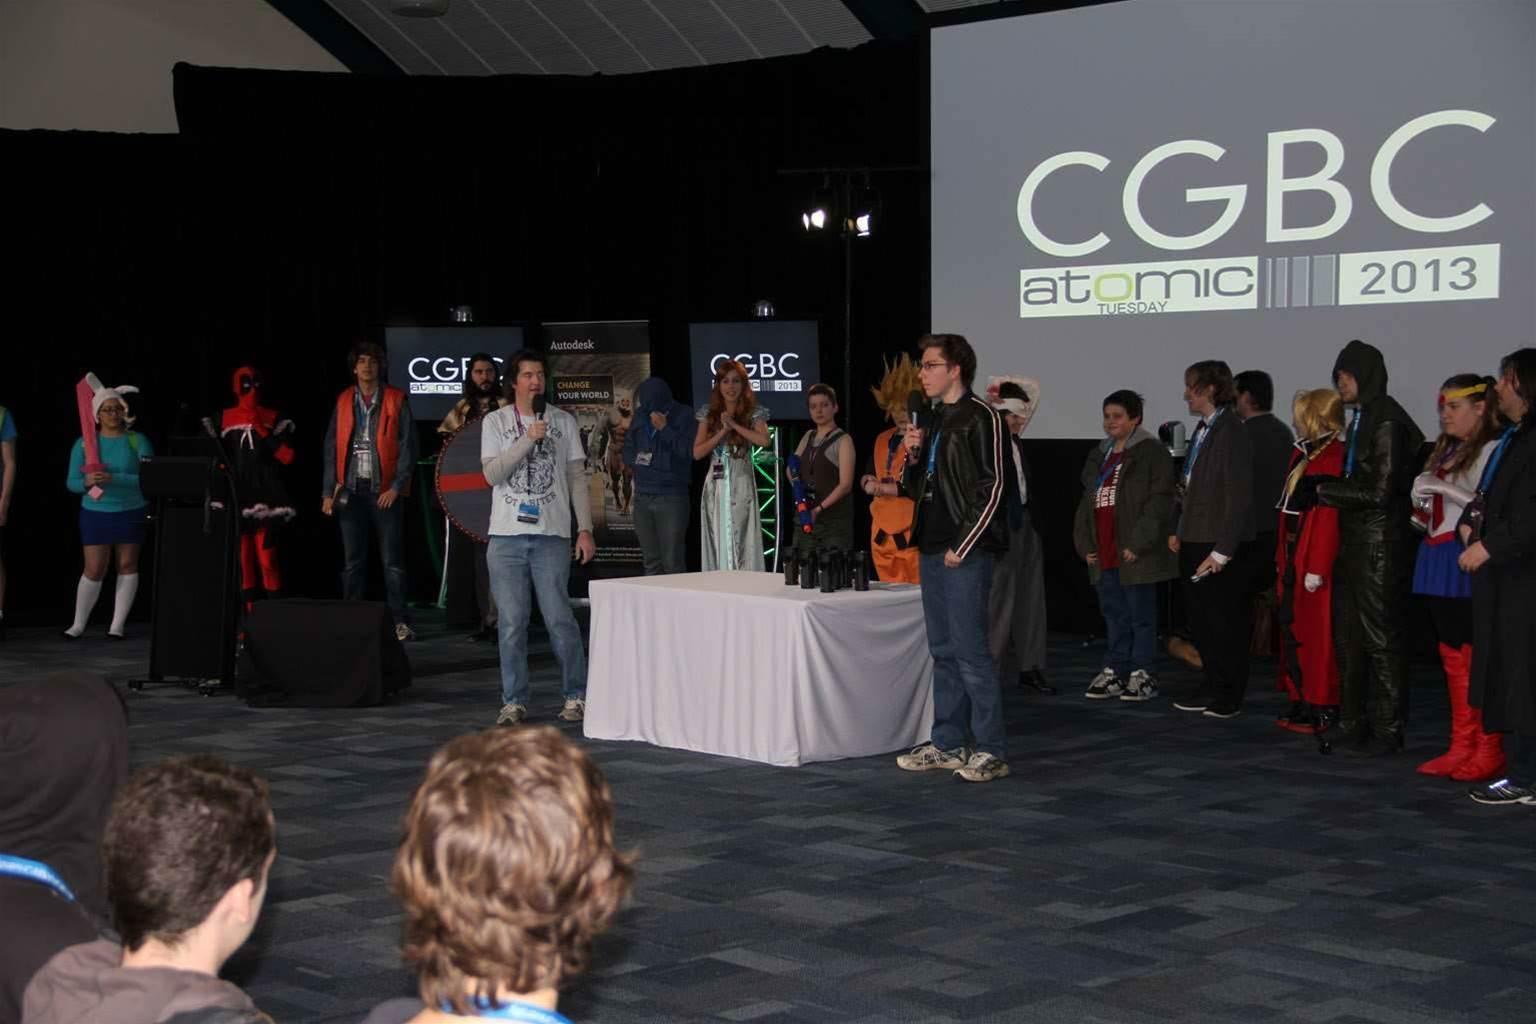 Atomic Tuesday at Monash's Computer Games Bootcamp 2013